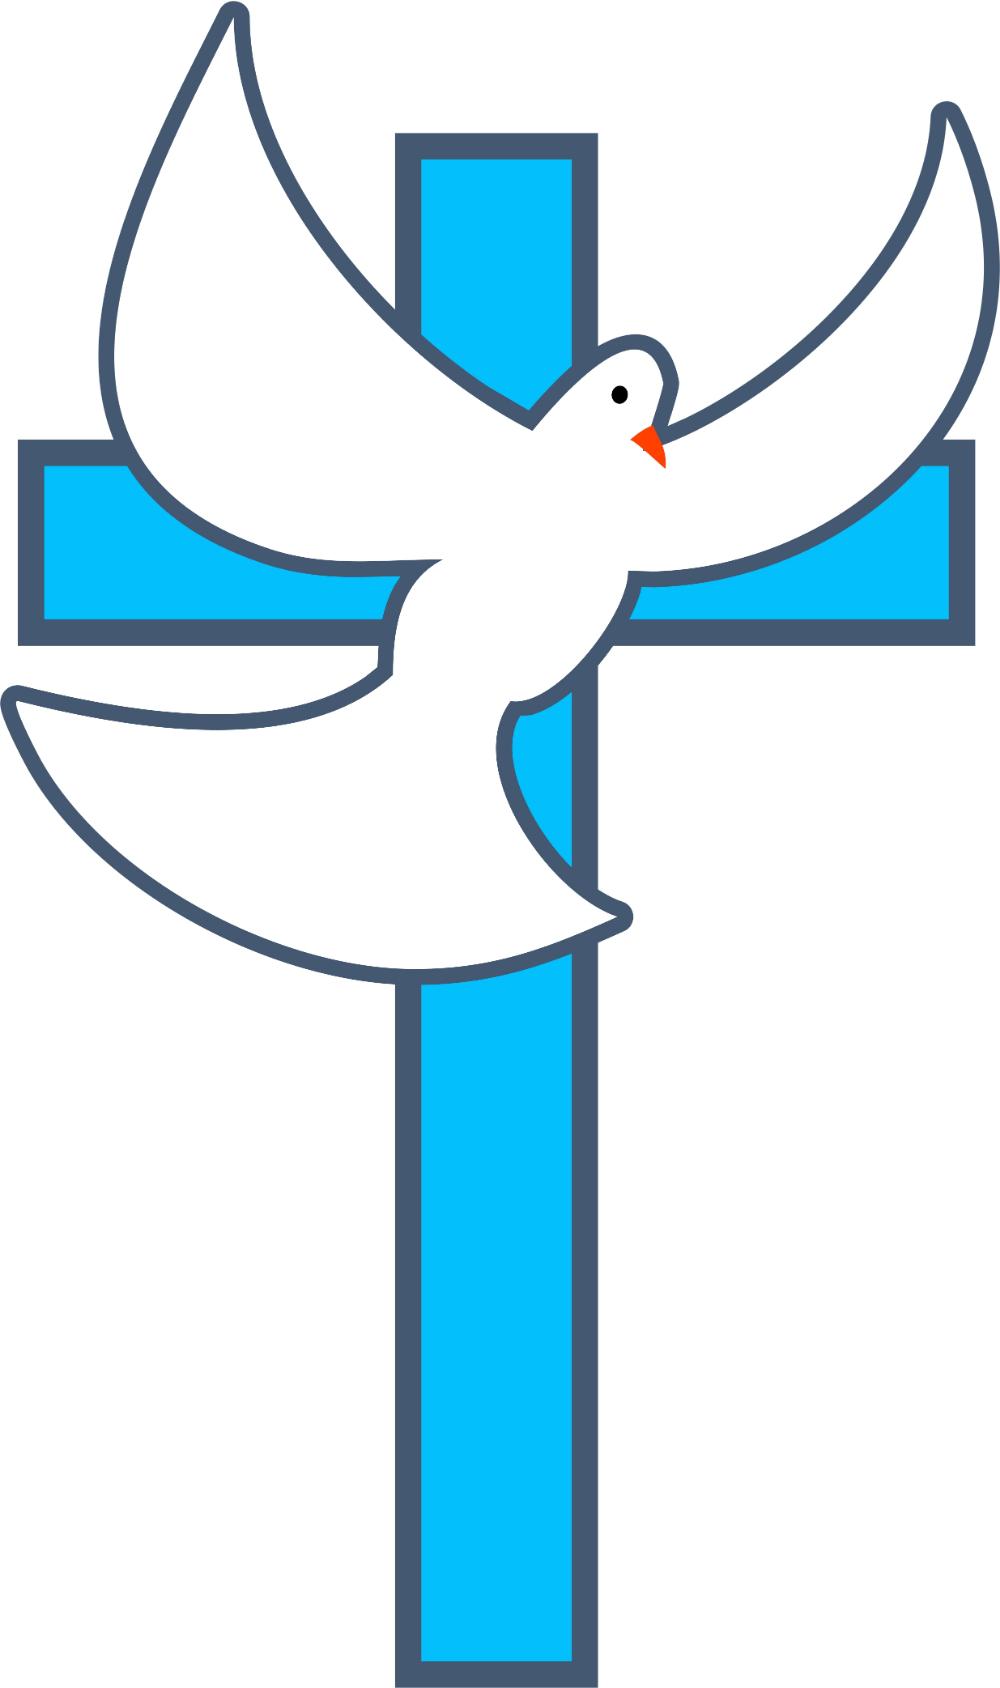 Cross Dove Image Vector Clip Art Online, Royalty Free